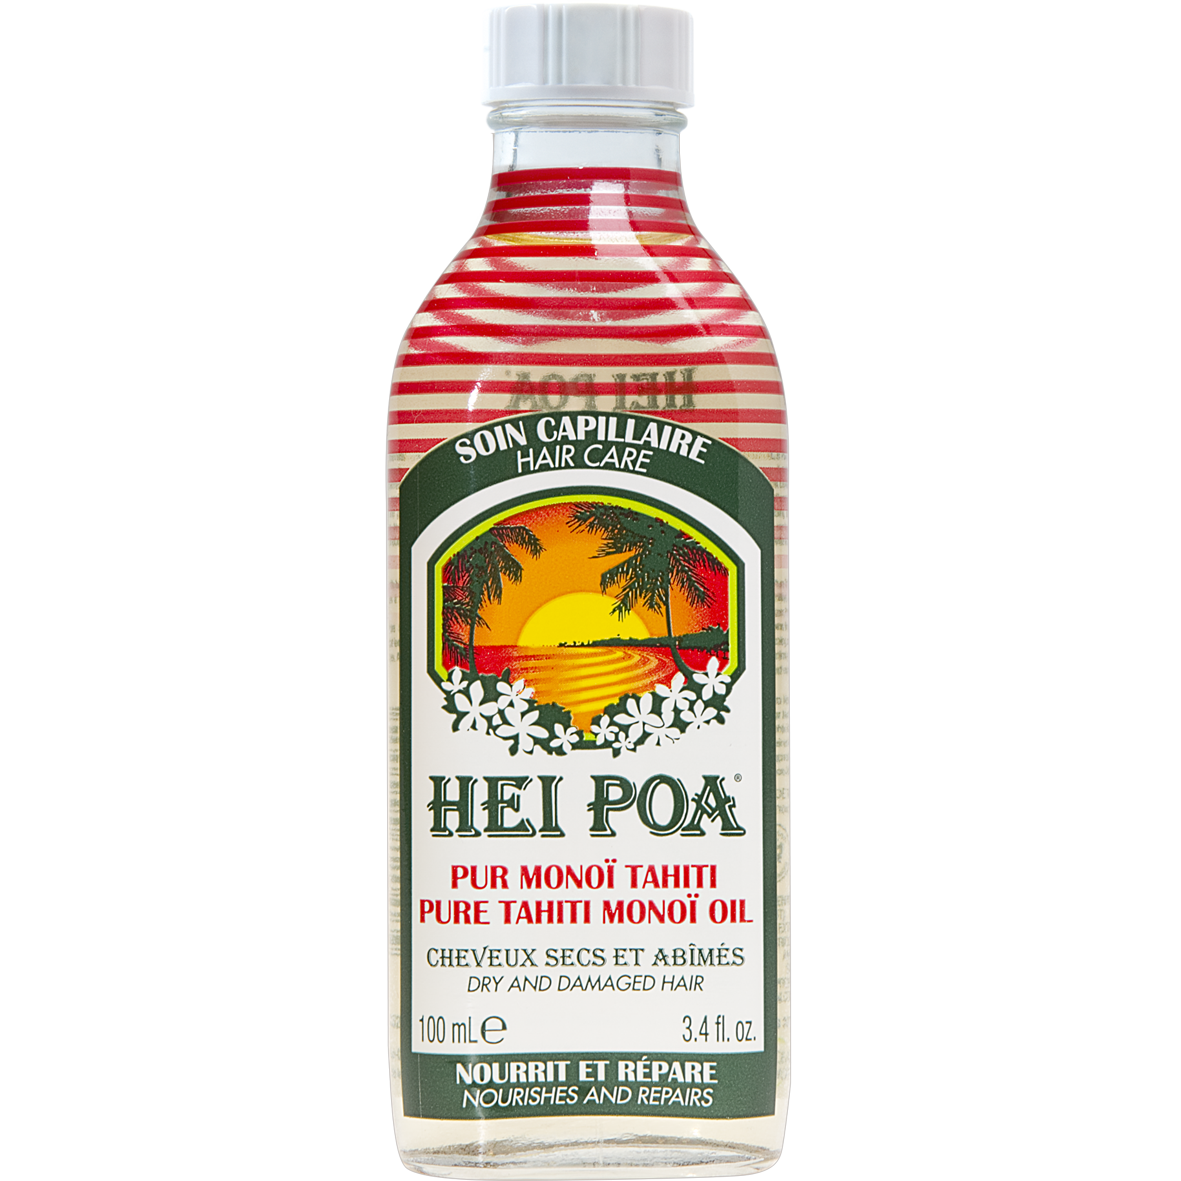 Hei Poa Pure Tahiti Monoi Oil For Hair - Θρεπτικό Λάδι για Ξηρά, Ταλαιπωρημένα κ υγιεινή   μαλλιά   μαλακτικά μάσκες ελιξίρια μαλλιών